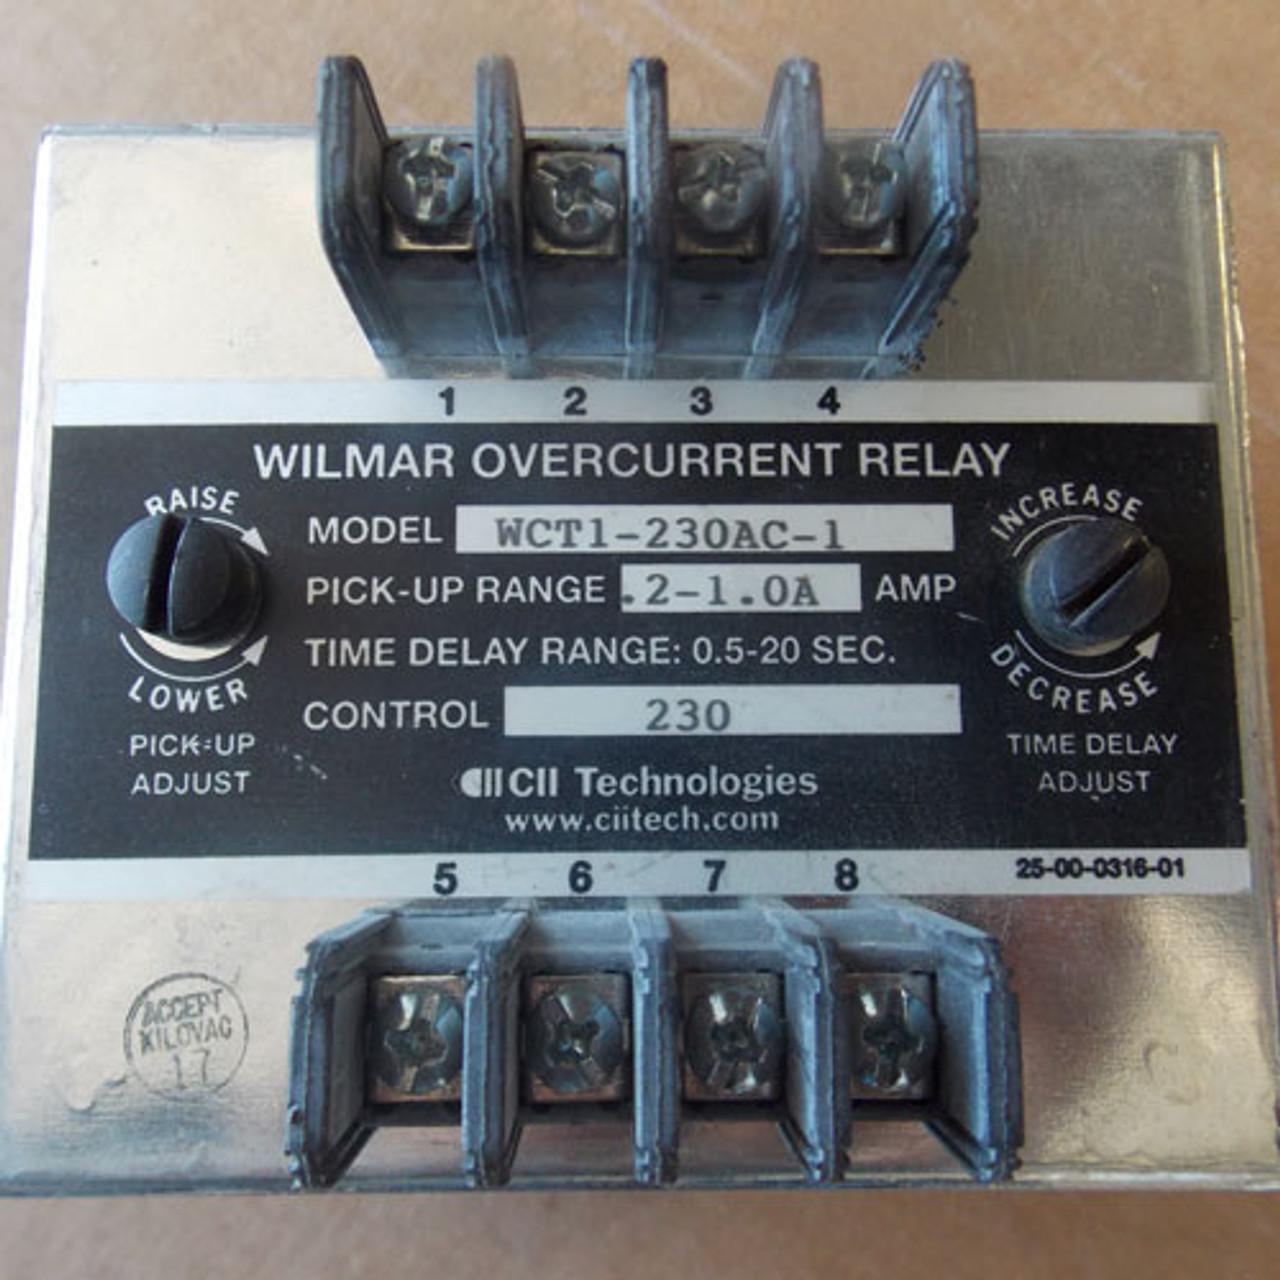 Wilmar WCT1-230AC-1 Overcurrent Relay 230 VAC -Used